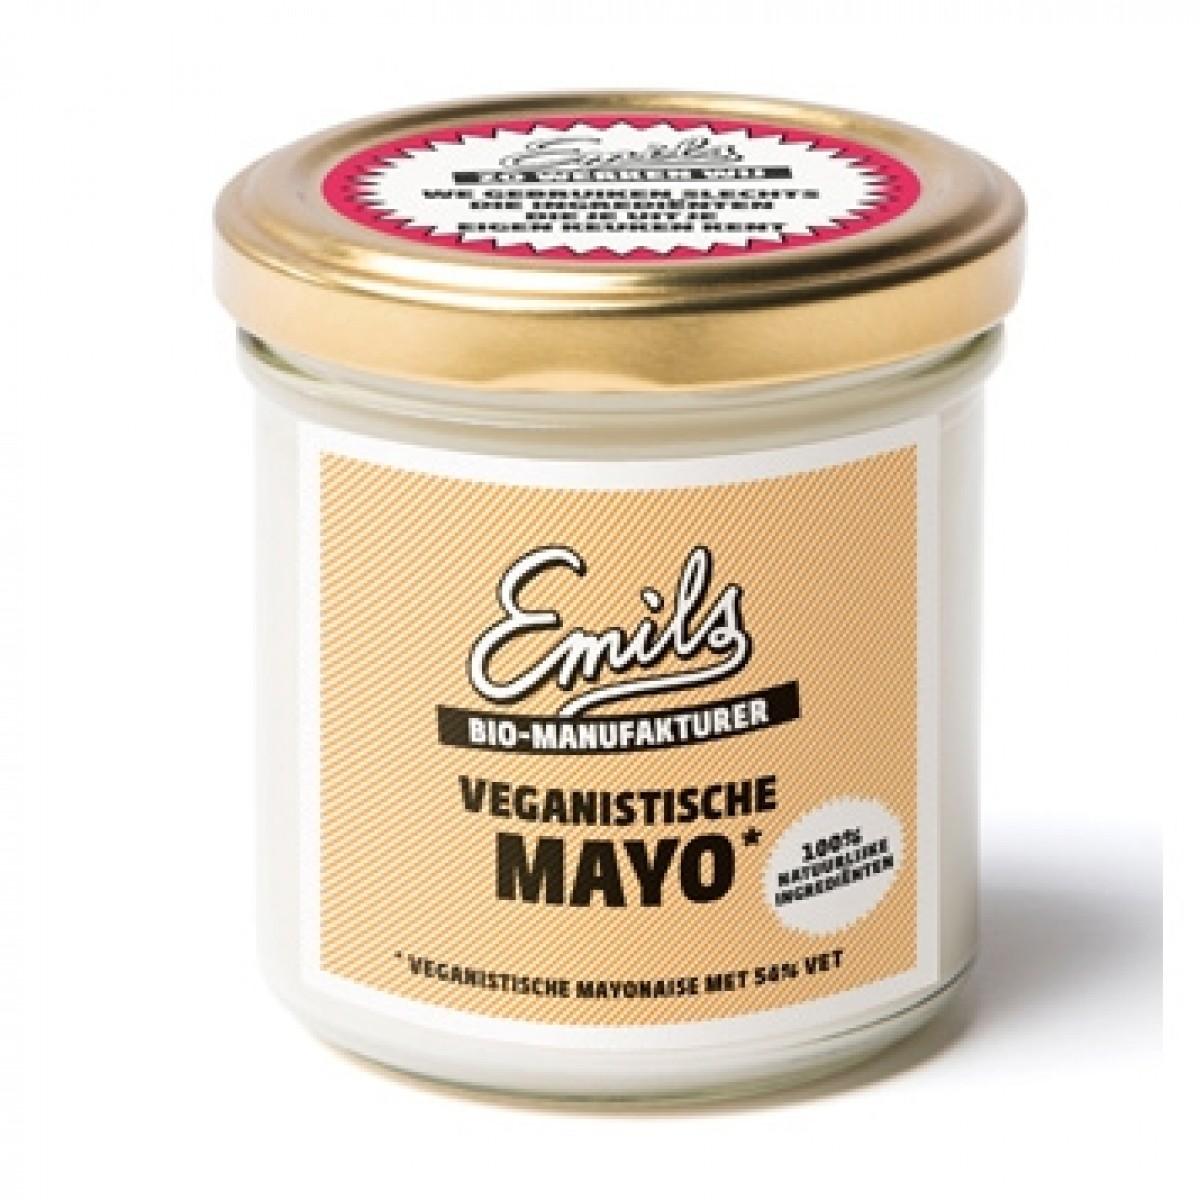 Veganistische Mayo